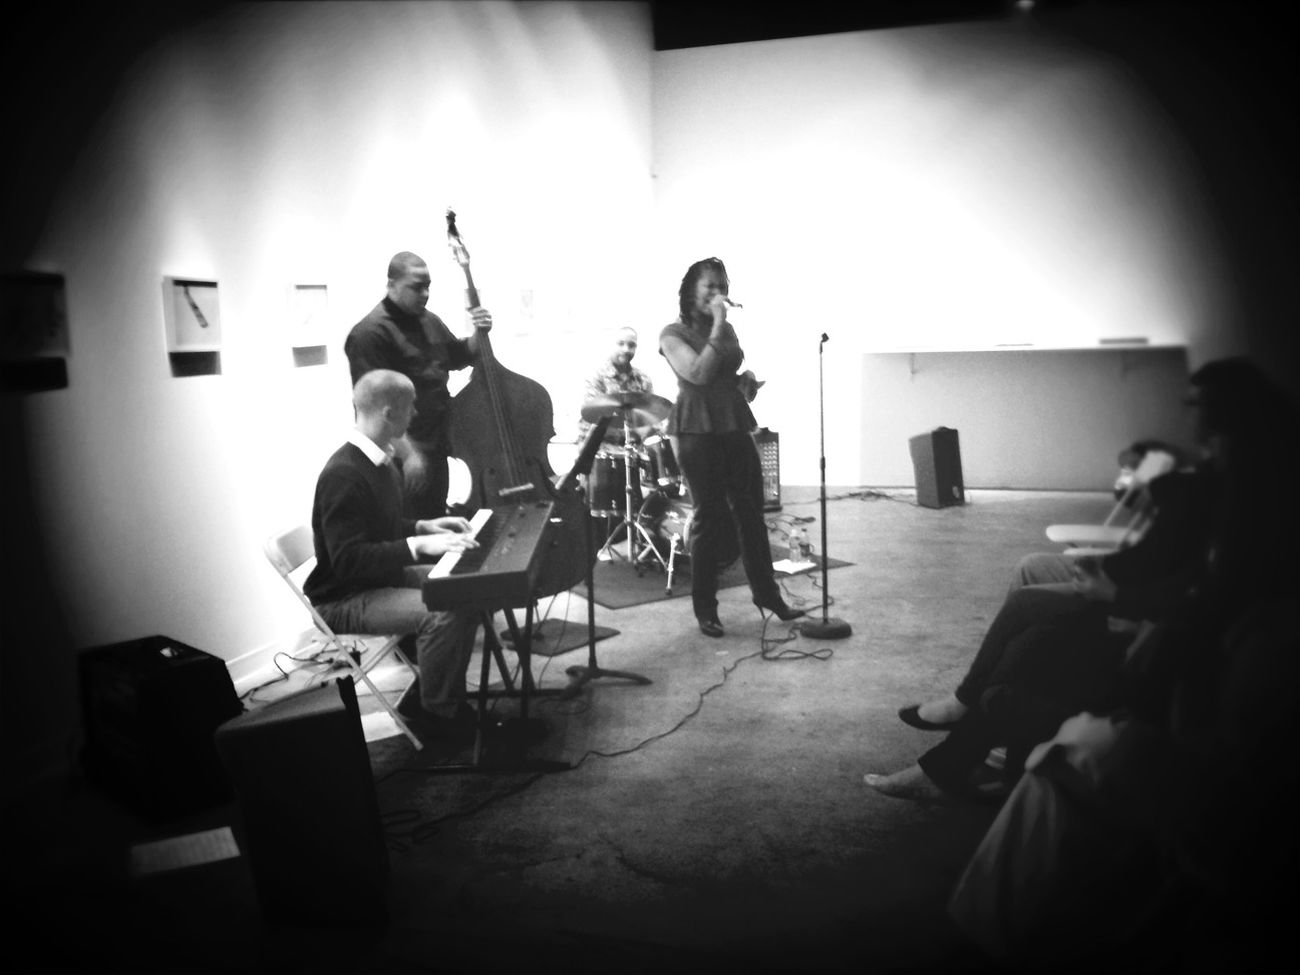 Blackandwhite Awesome Performance